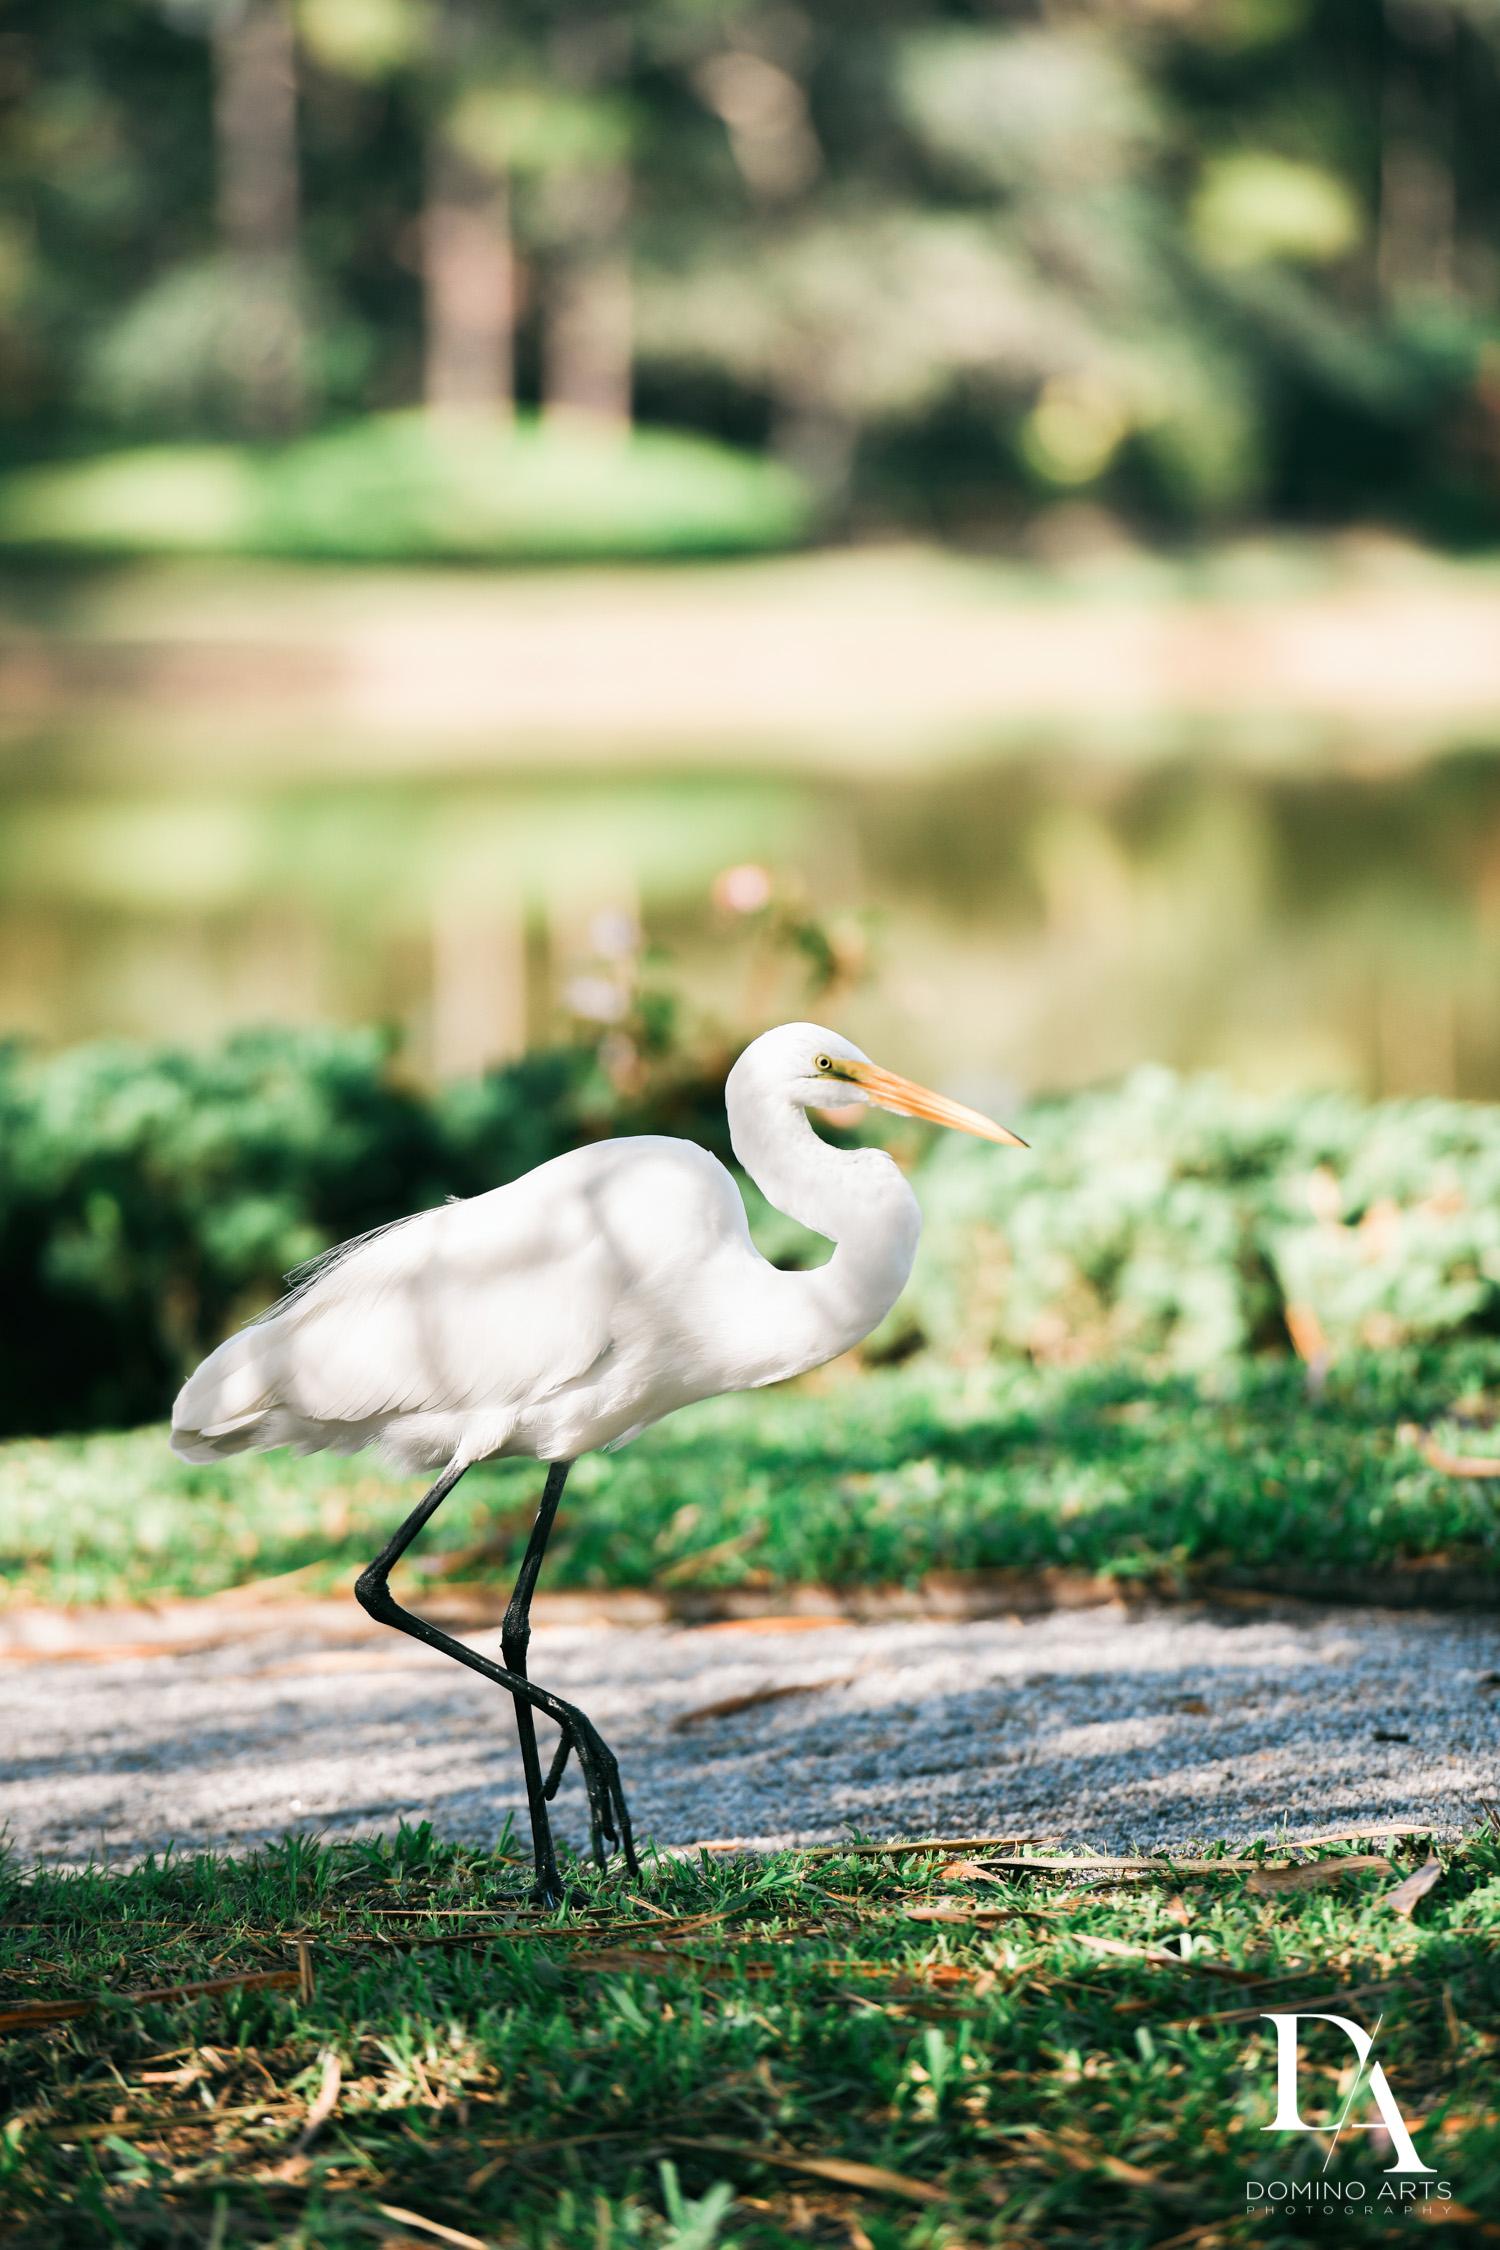 Animals at Japanese Garden Engagement Photography at Morikami by Domino Arts